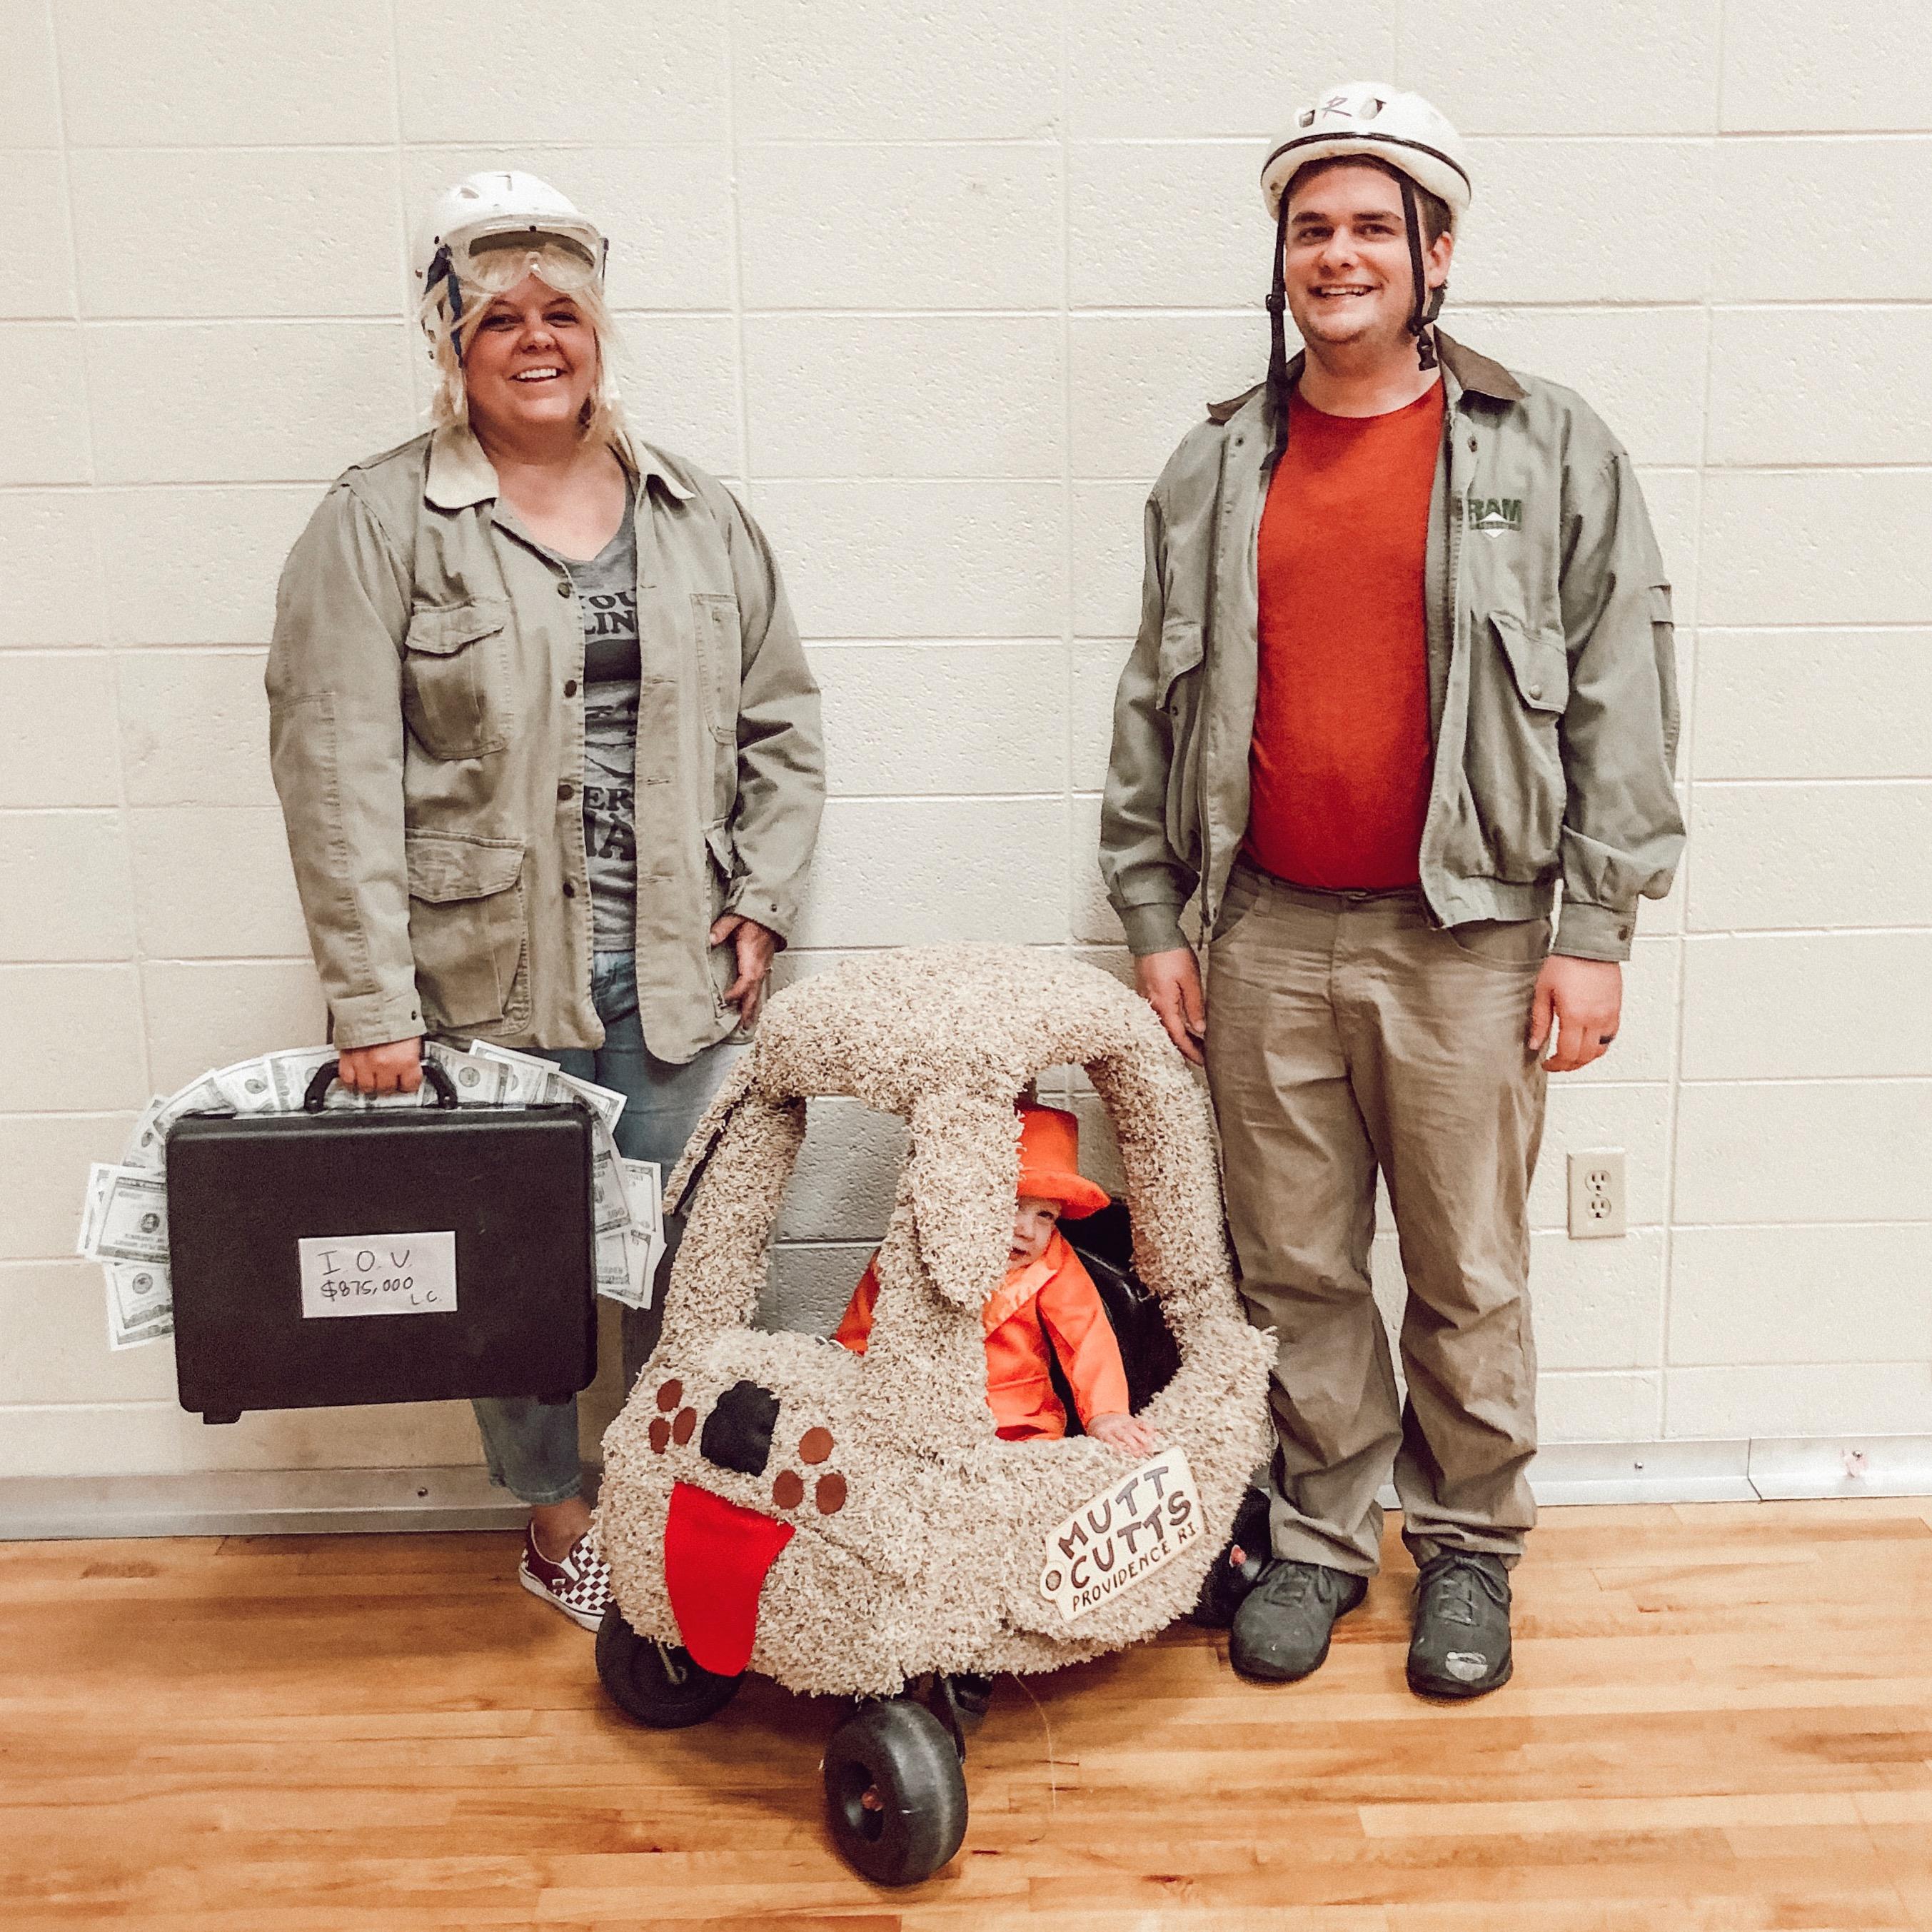 Lloyd Christmas- Dumb & Dumber Halloween Costume!